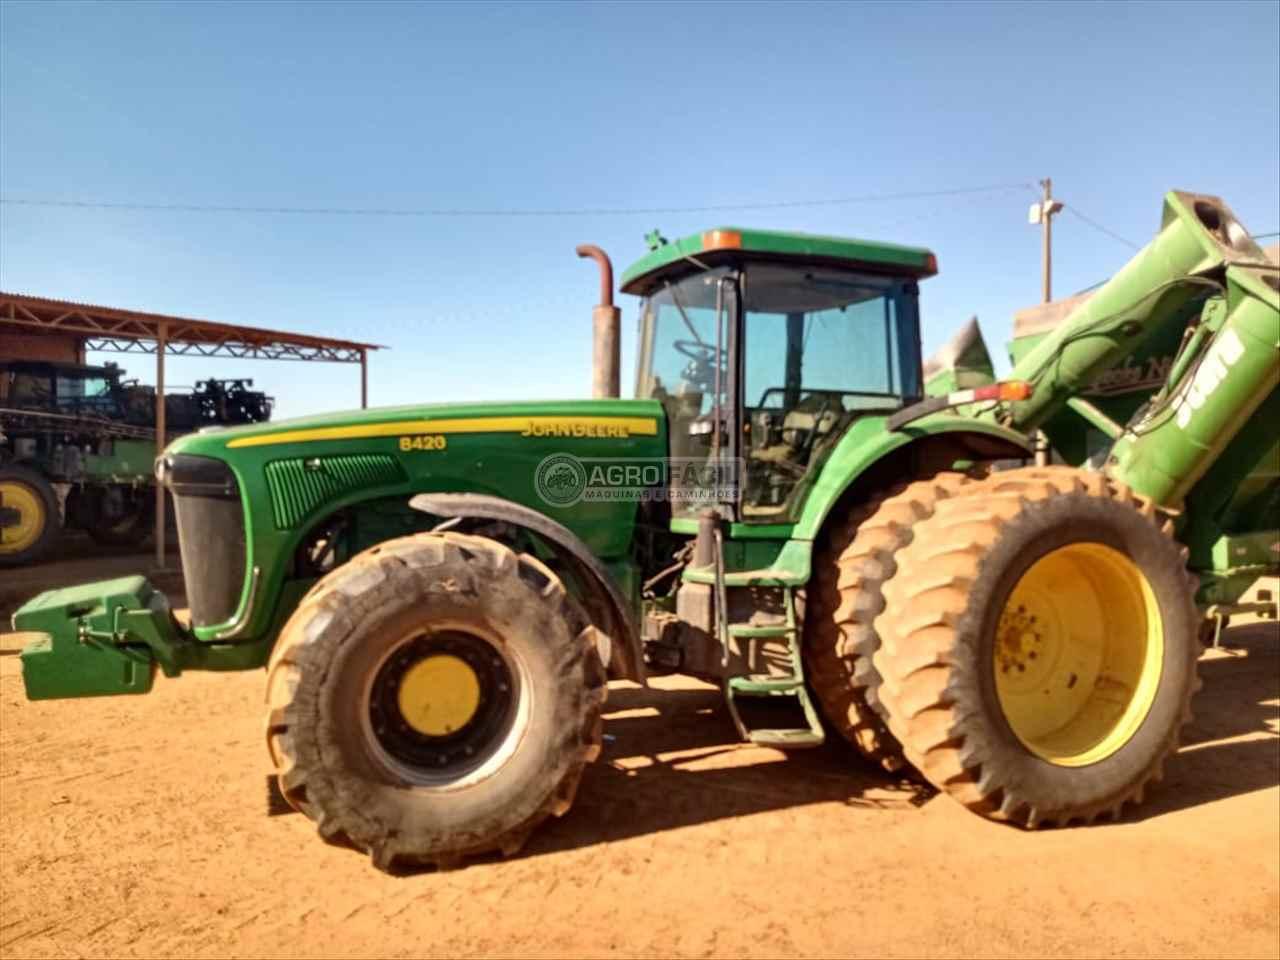 JOHN DEERE 8420 de Agro Fácil Máquinas - PRIMAVERA DO LESTE/MT